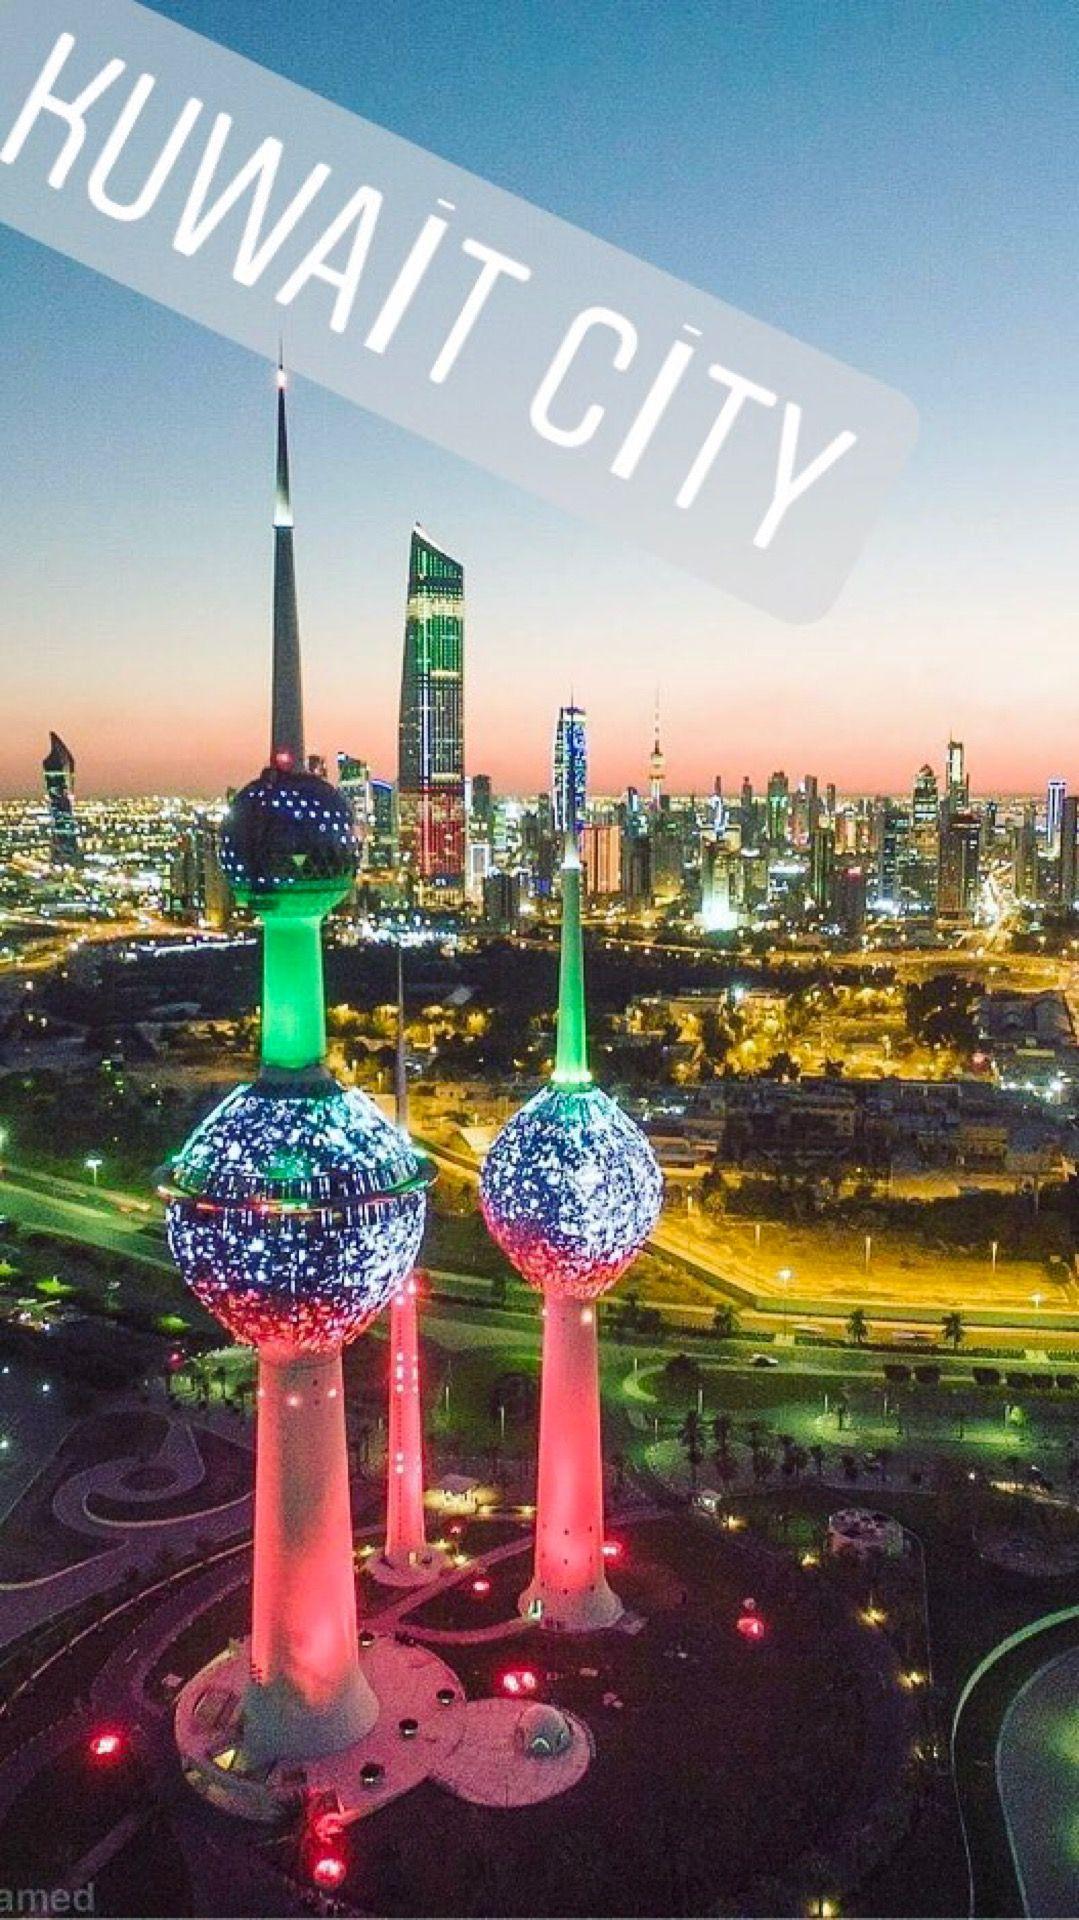 Kuwait City in 2019 | Skyline | Kuwait food, City, Arab world